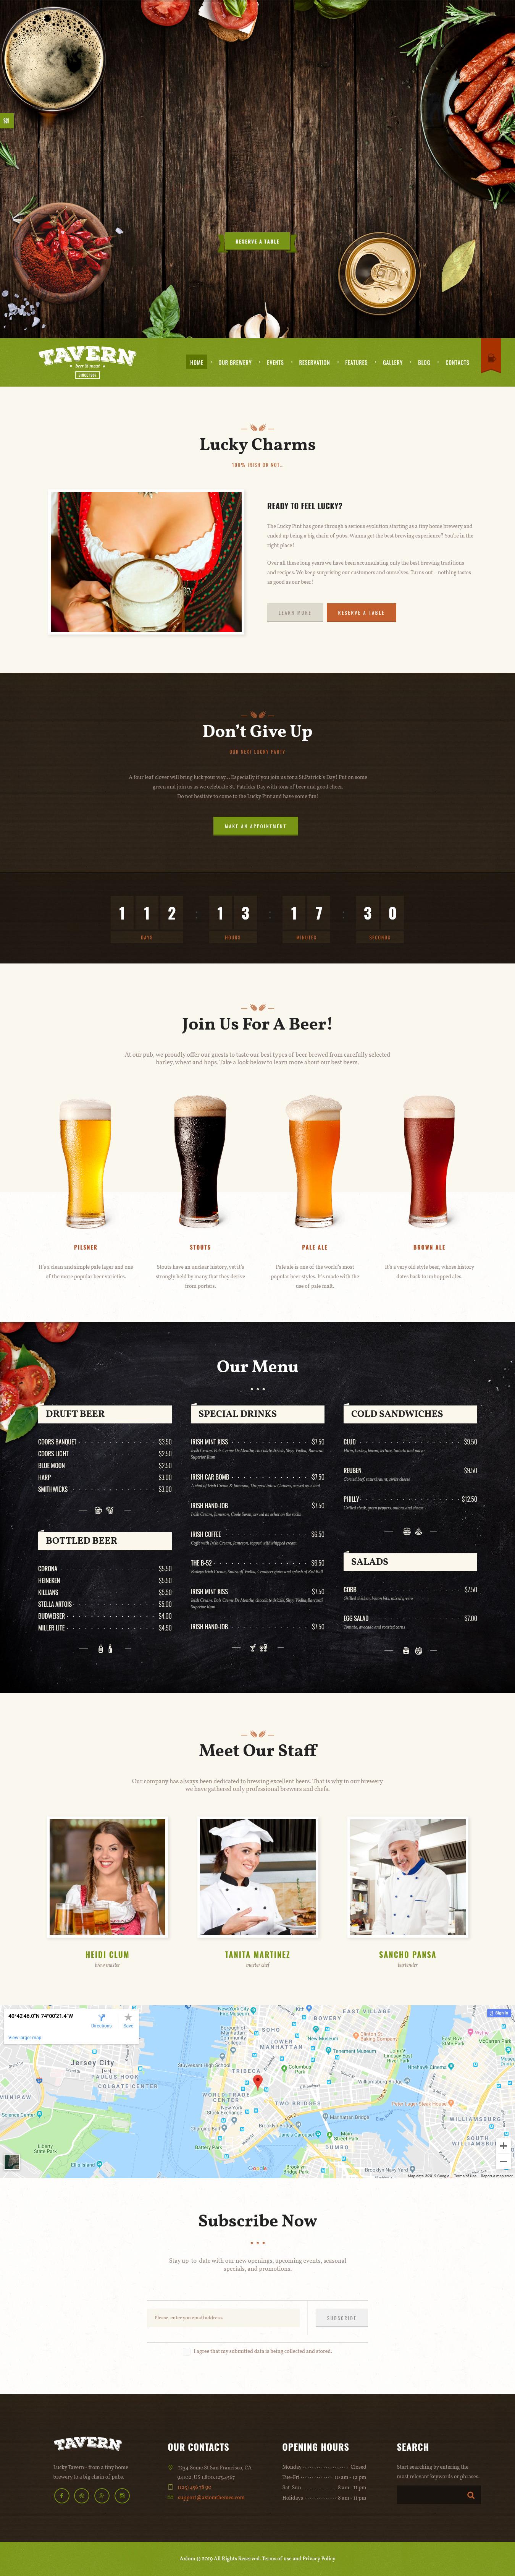 tavern best premium bar pub wordpress theme - 10+ Best Premium Bar and Pub WordPress Themes